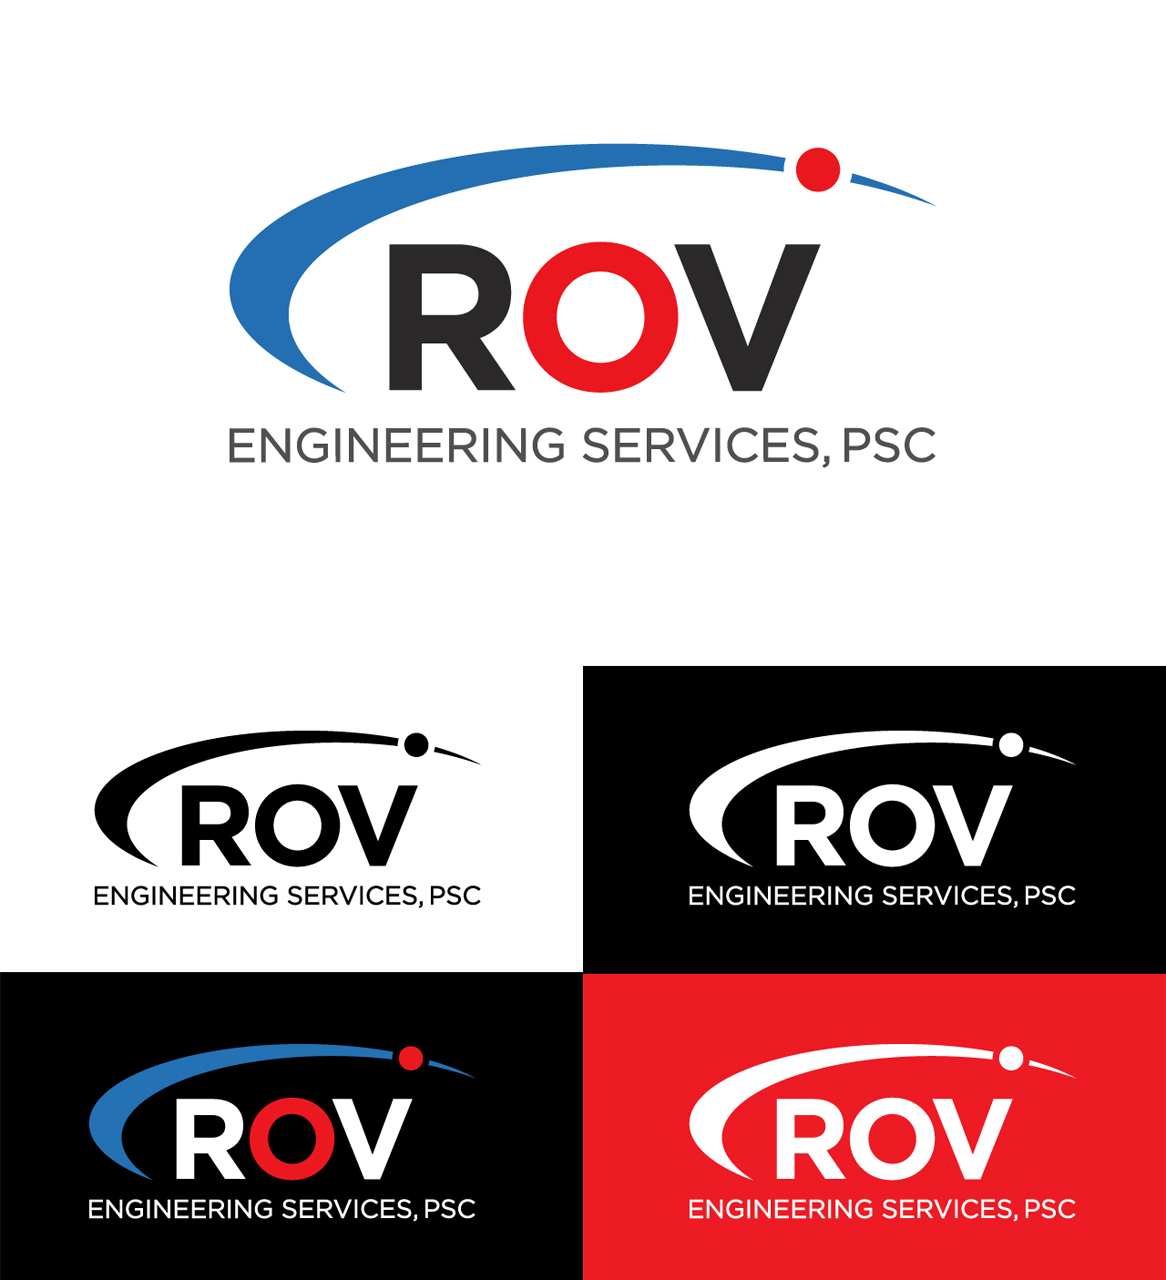 Professional, Modern, It Company Logo Design for ROV